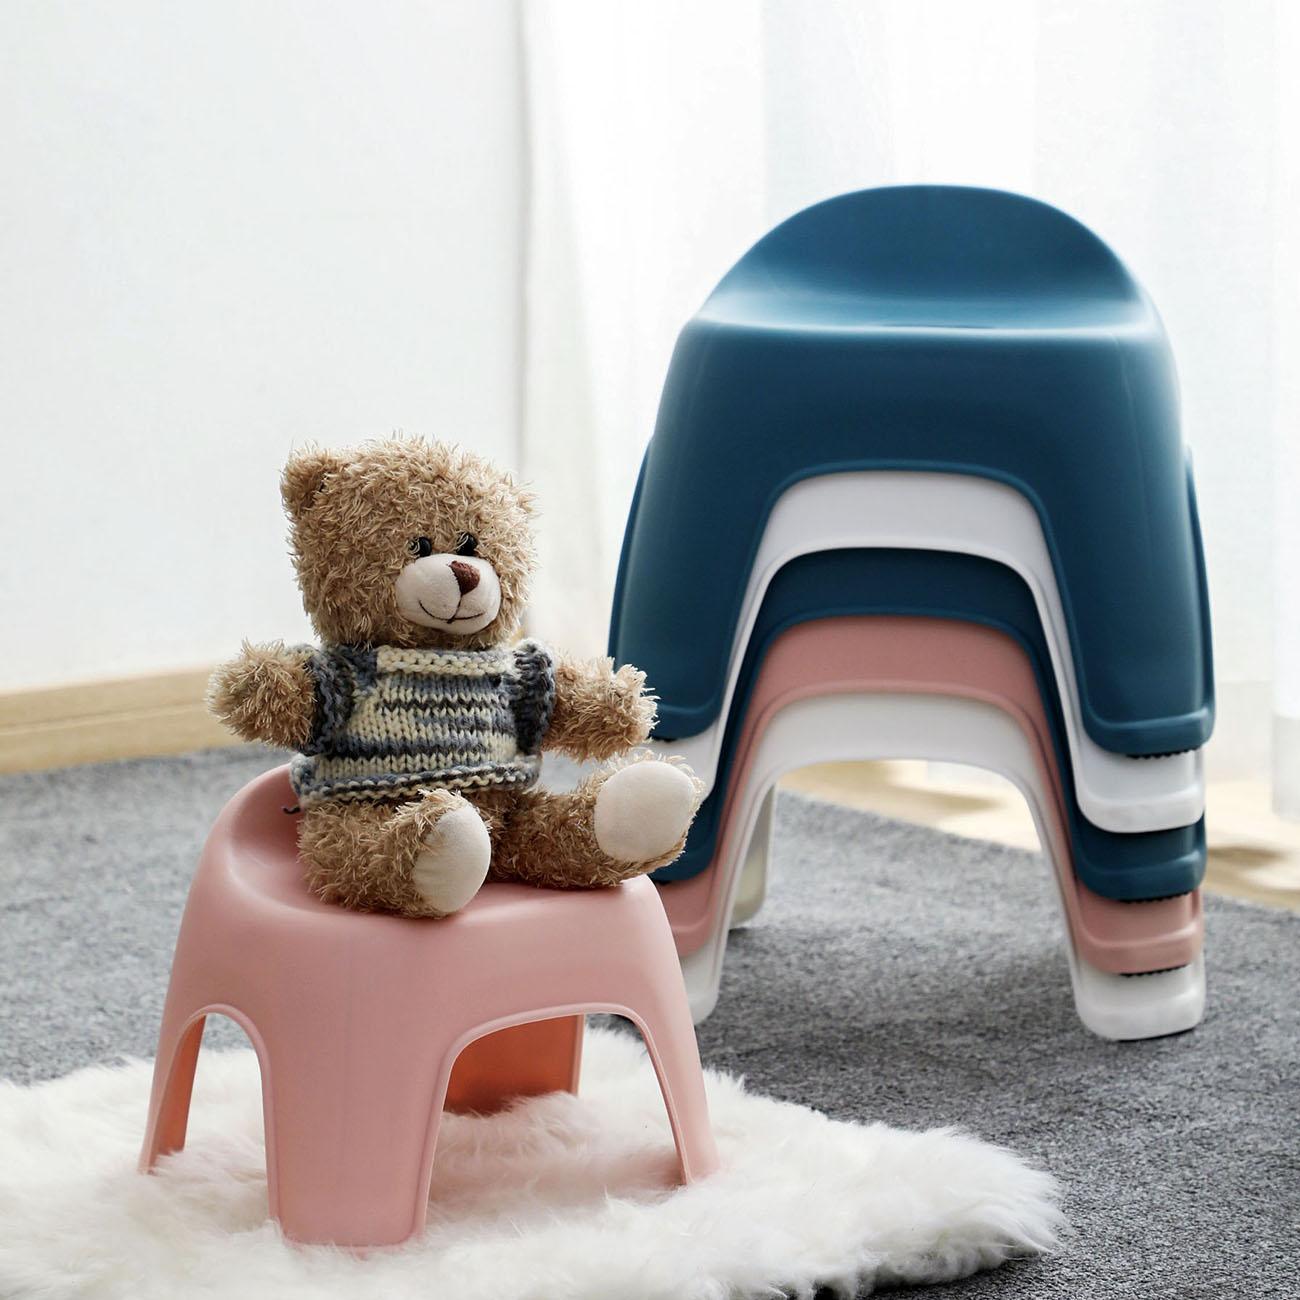 Thicken Baby Kids Stool Plastic Backrest Stool Living Room Non-slip Change Shoe Bench Kindergarten Kids Child Study Stool